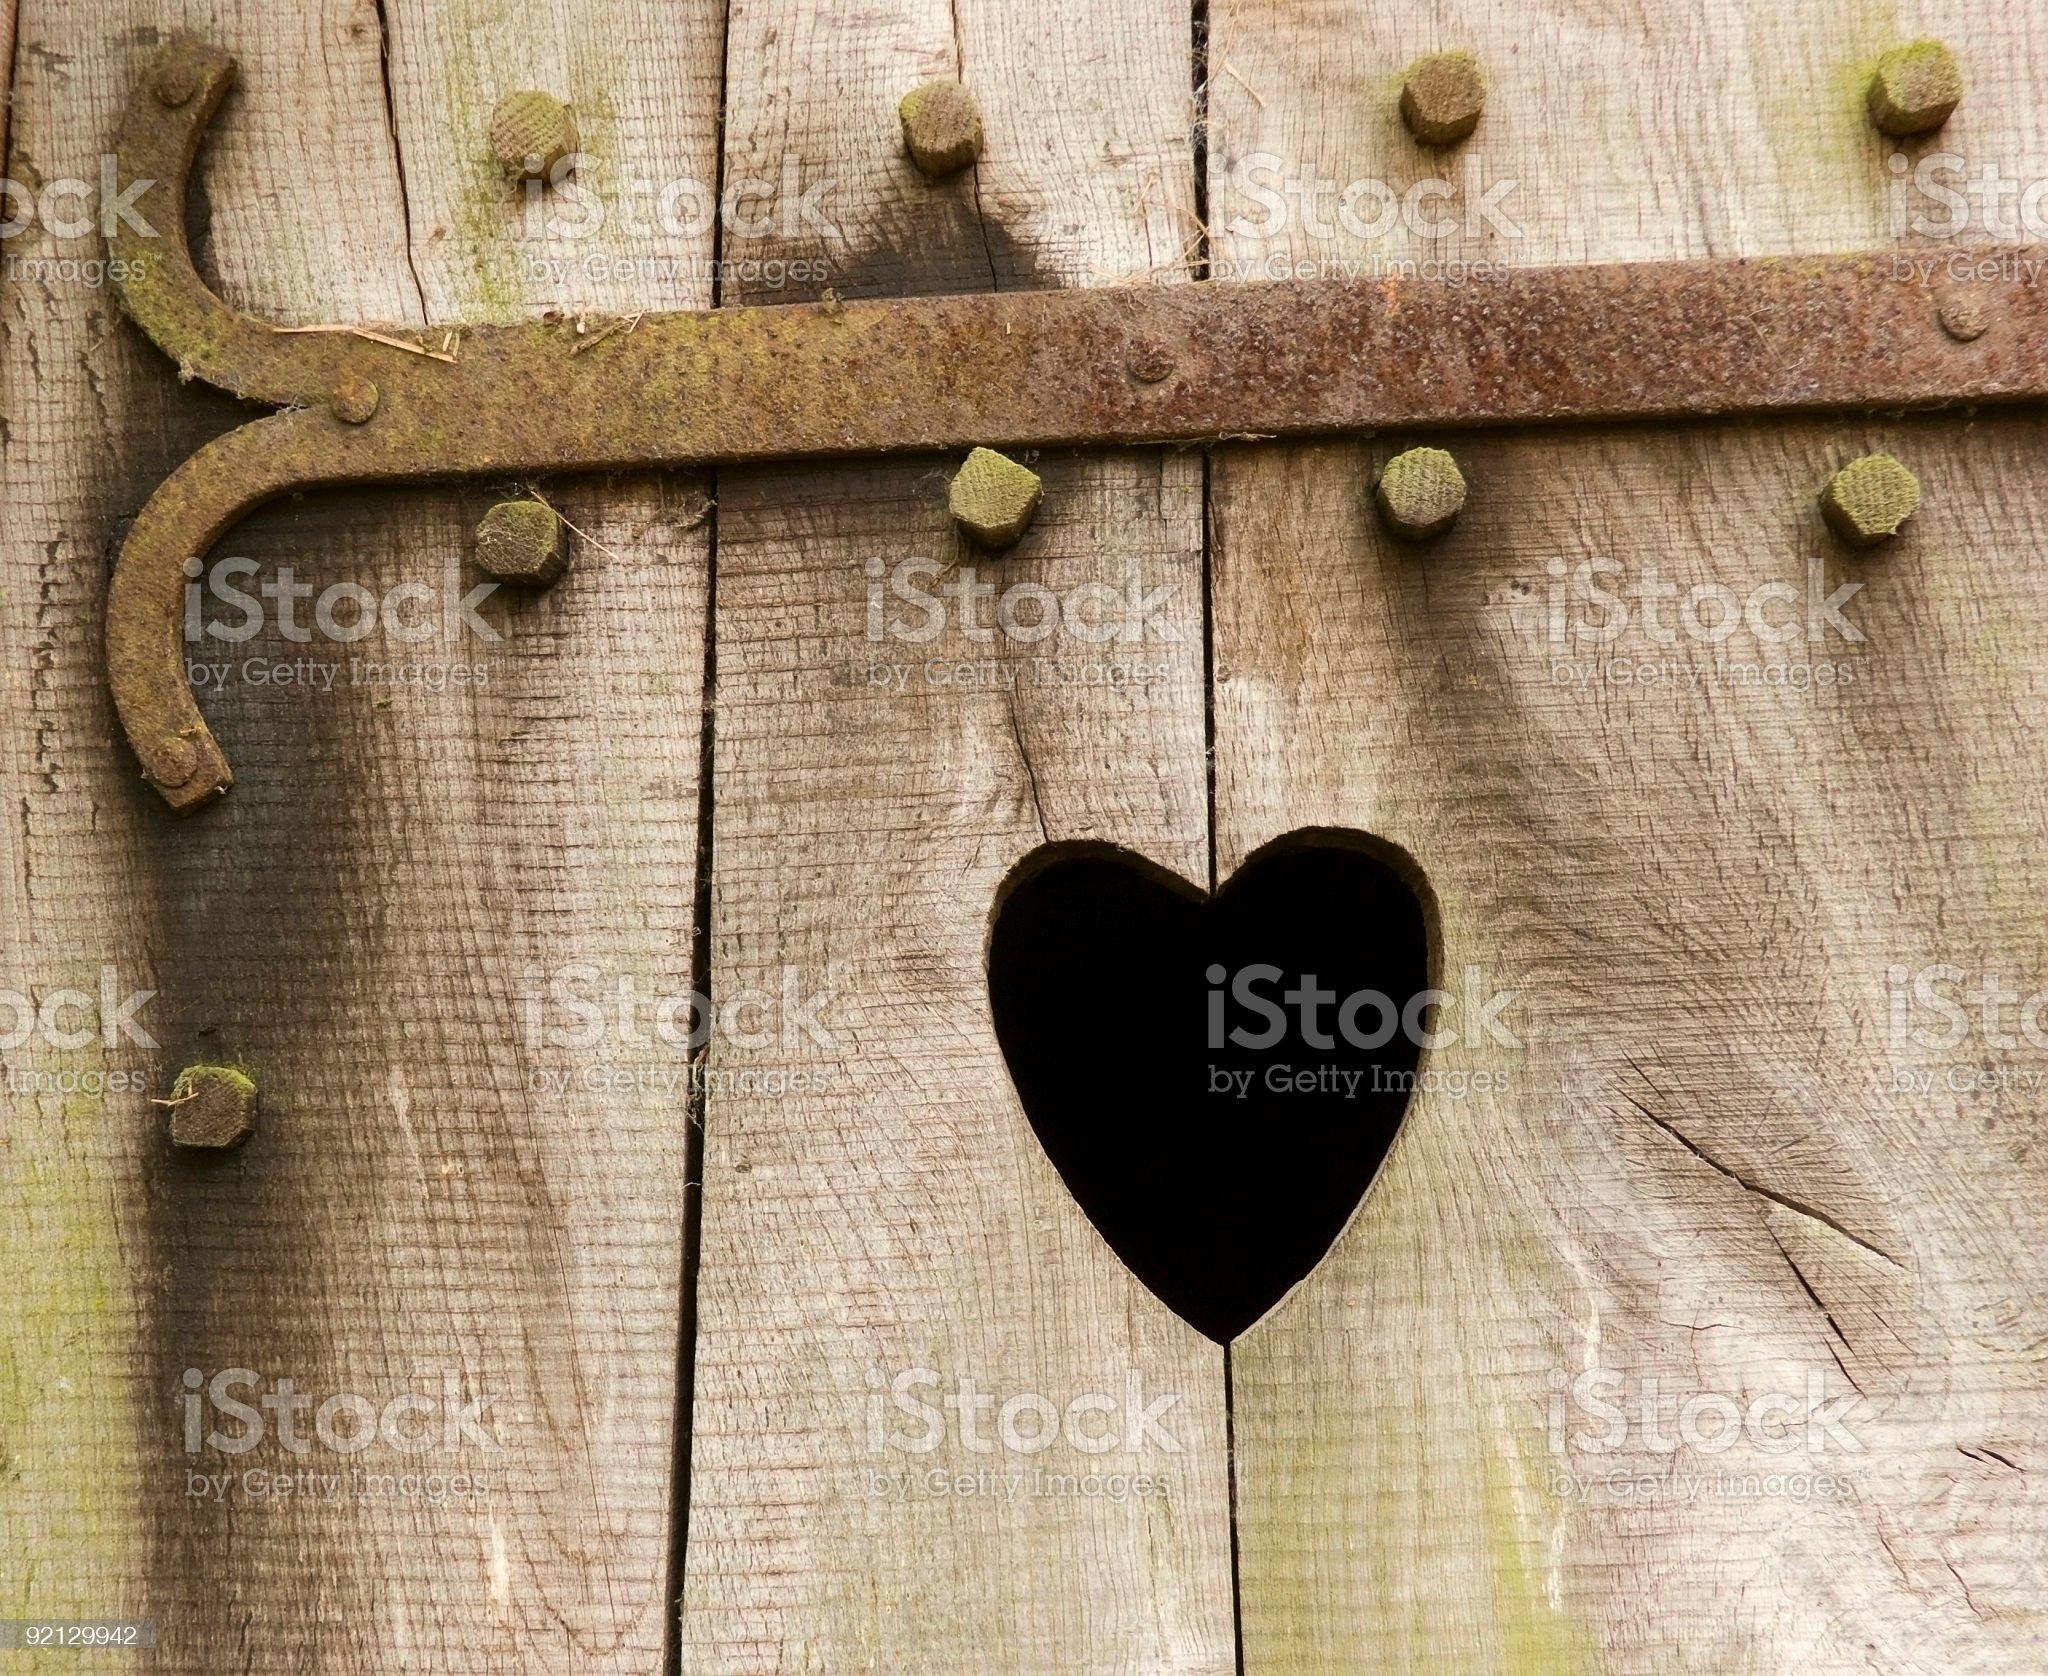 Wooden door with heart royalty-free stock photo